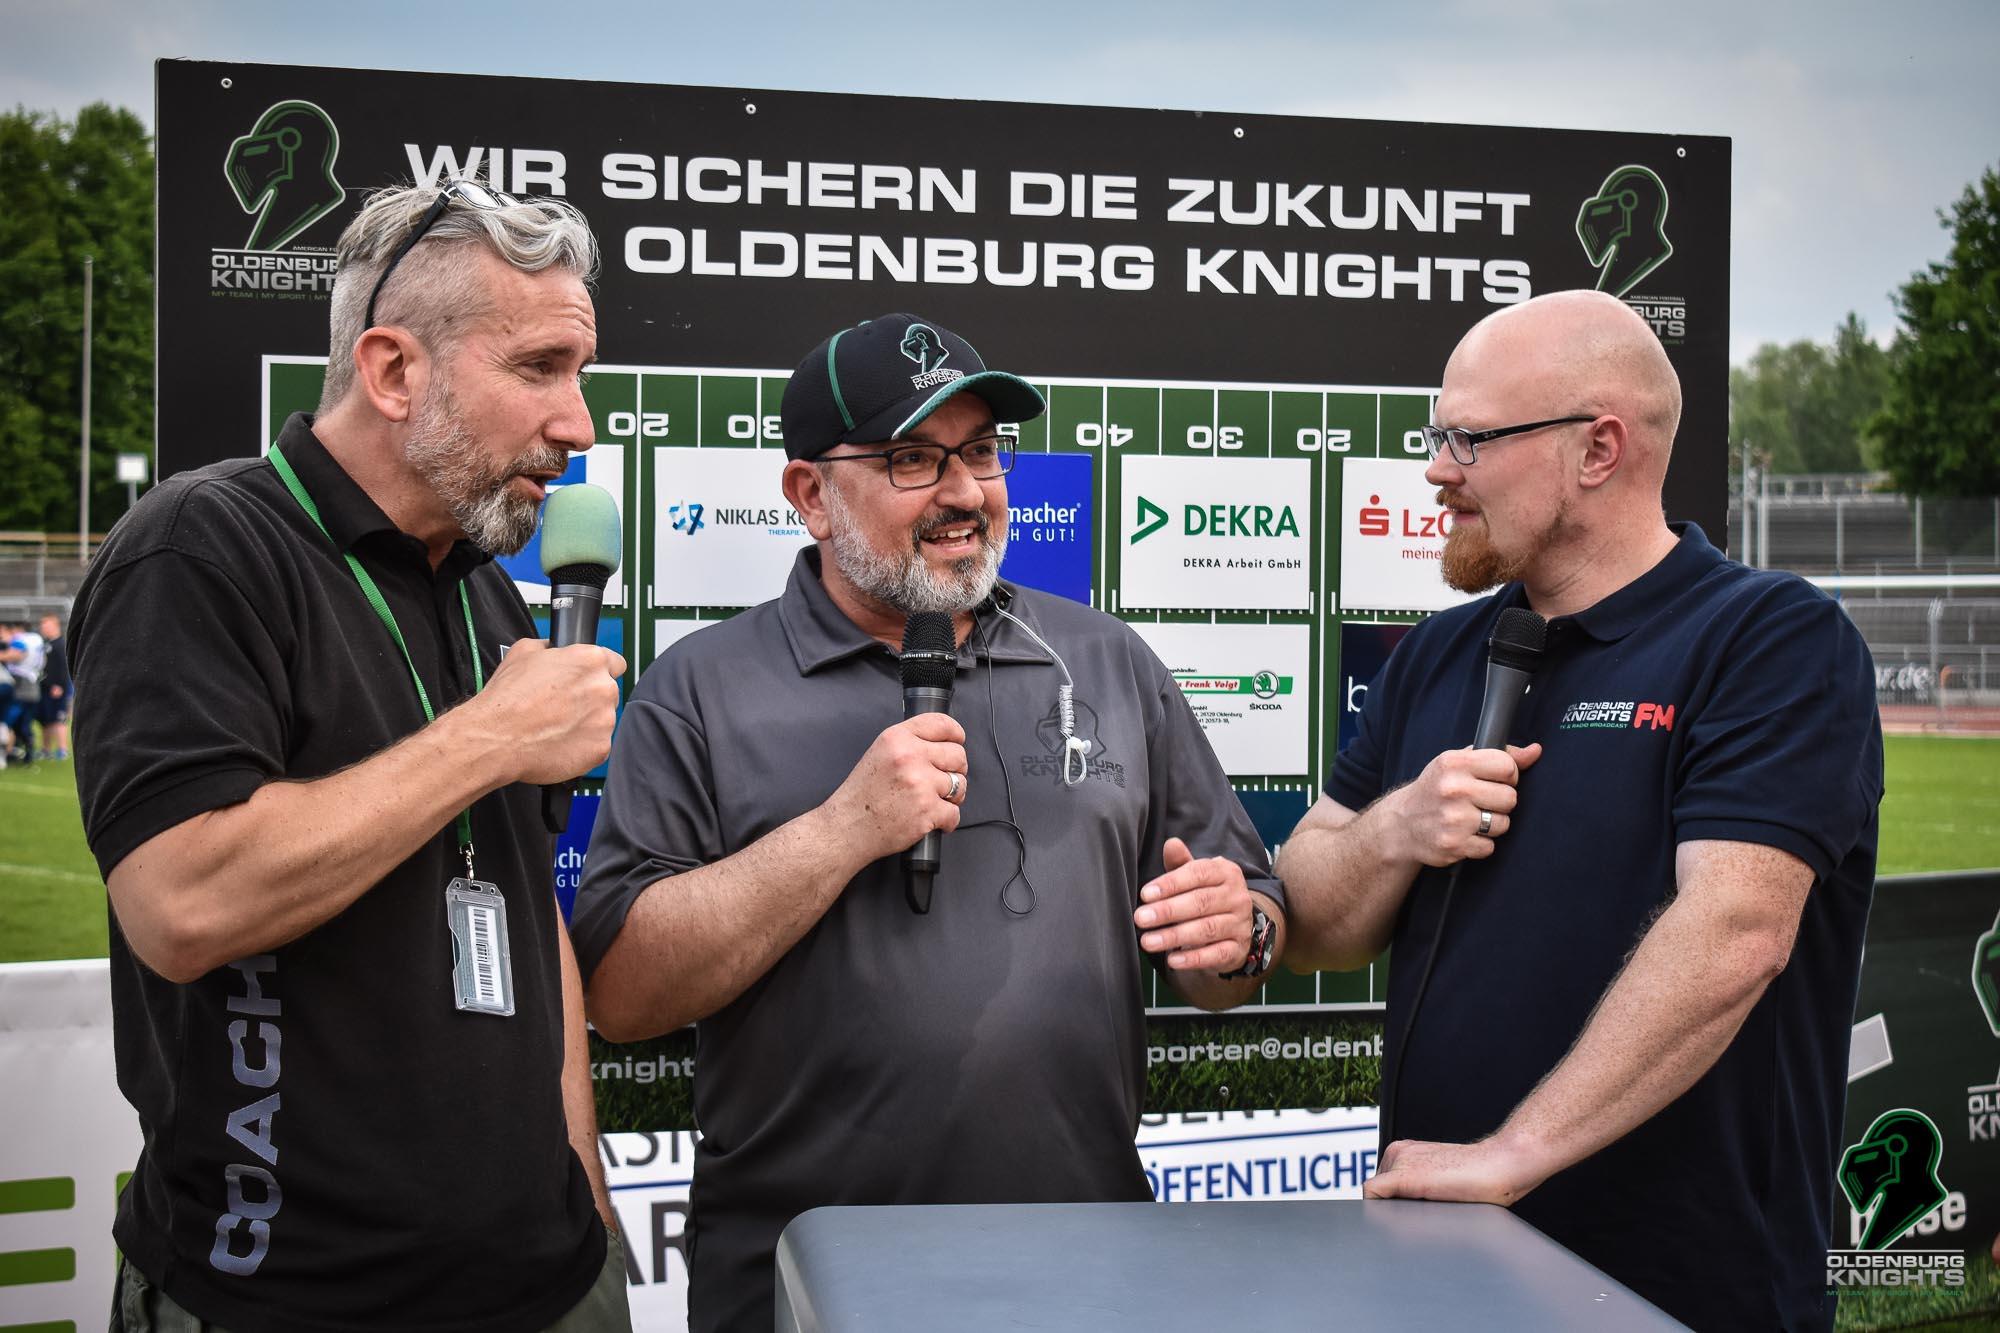 https://www.oldenburgknights.de/wp-content/uploads/2018/05/knights-bluedevils-0827.jpg